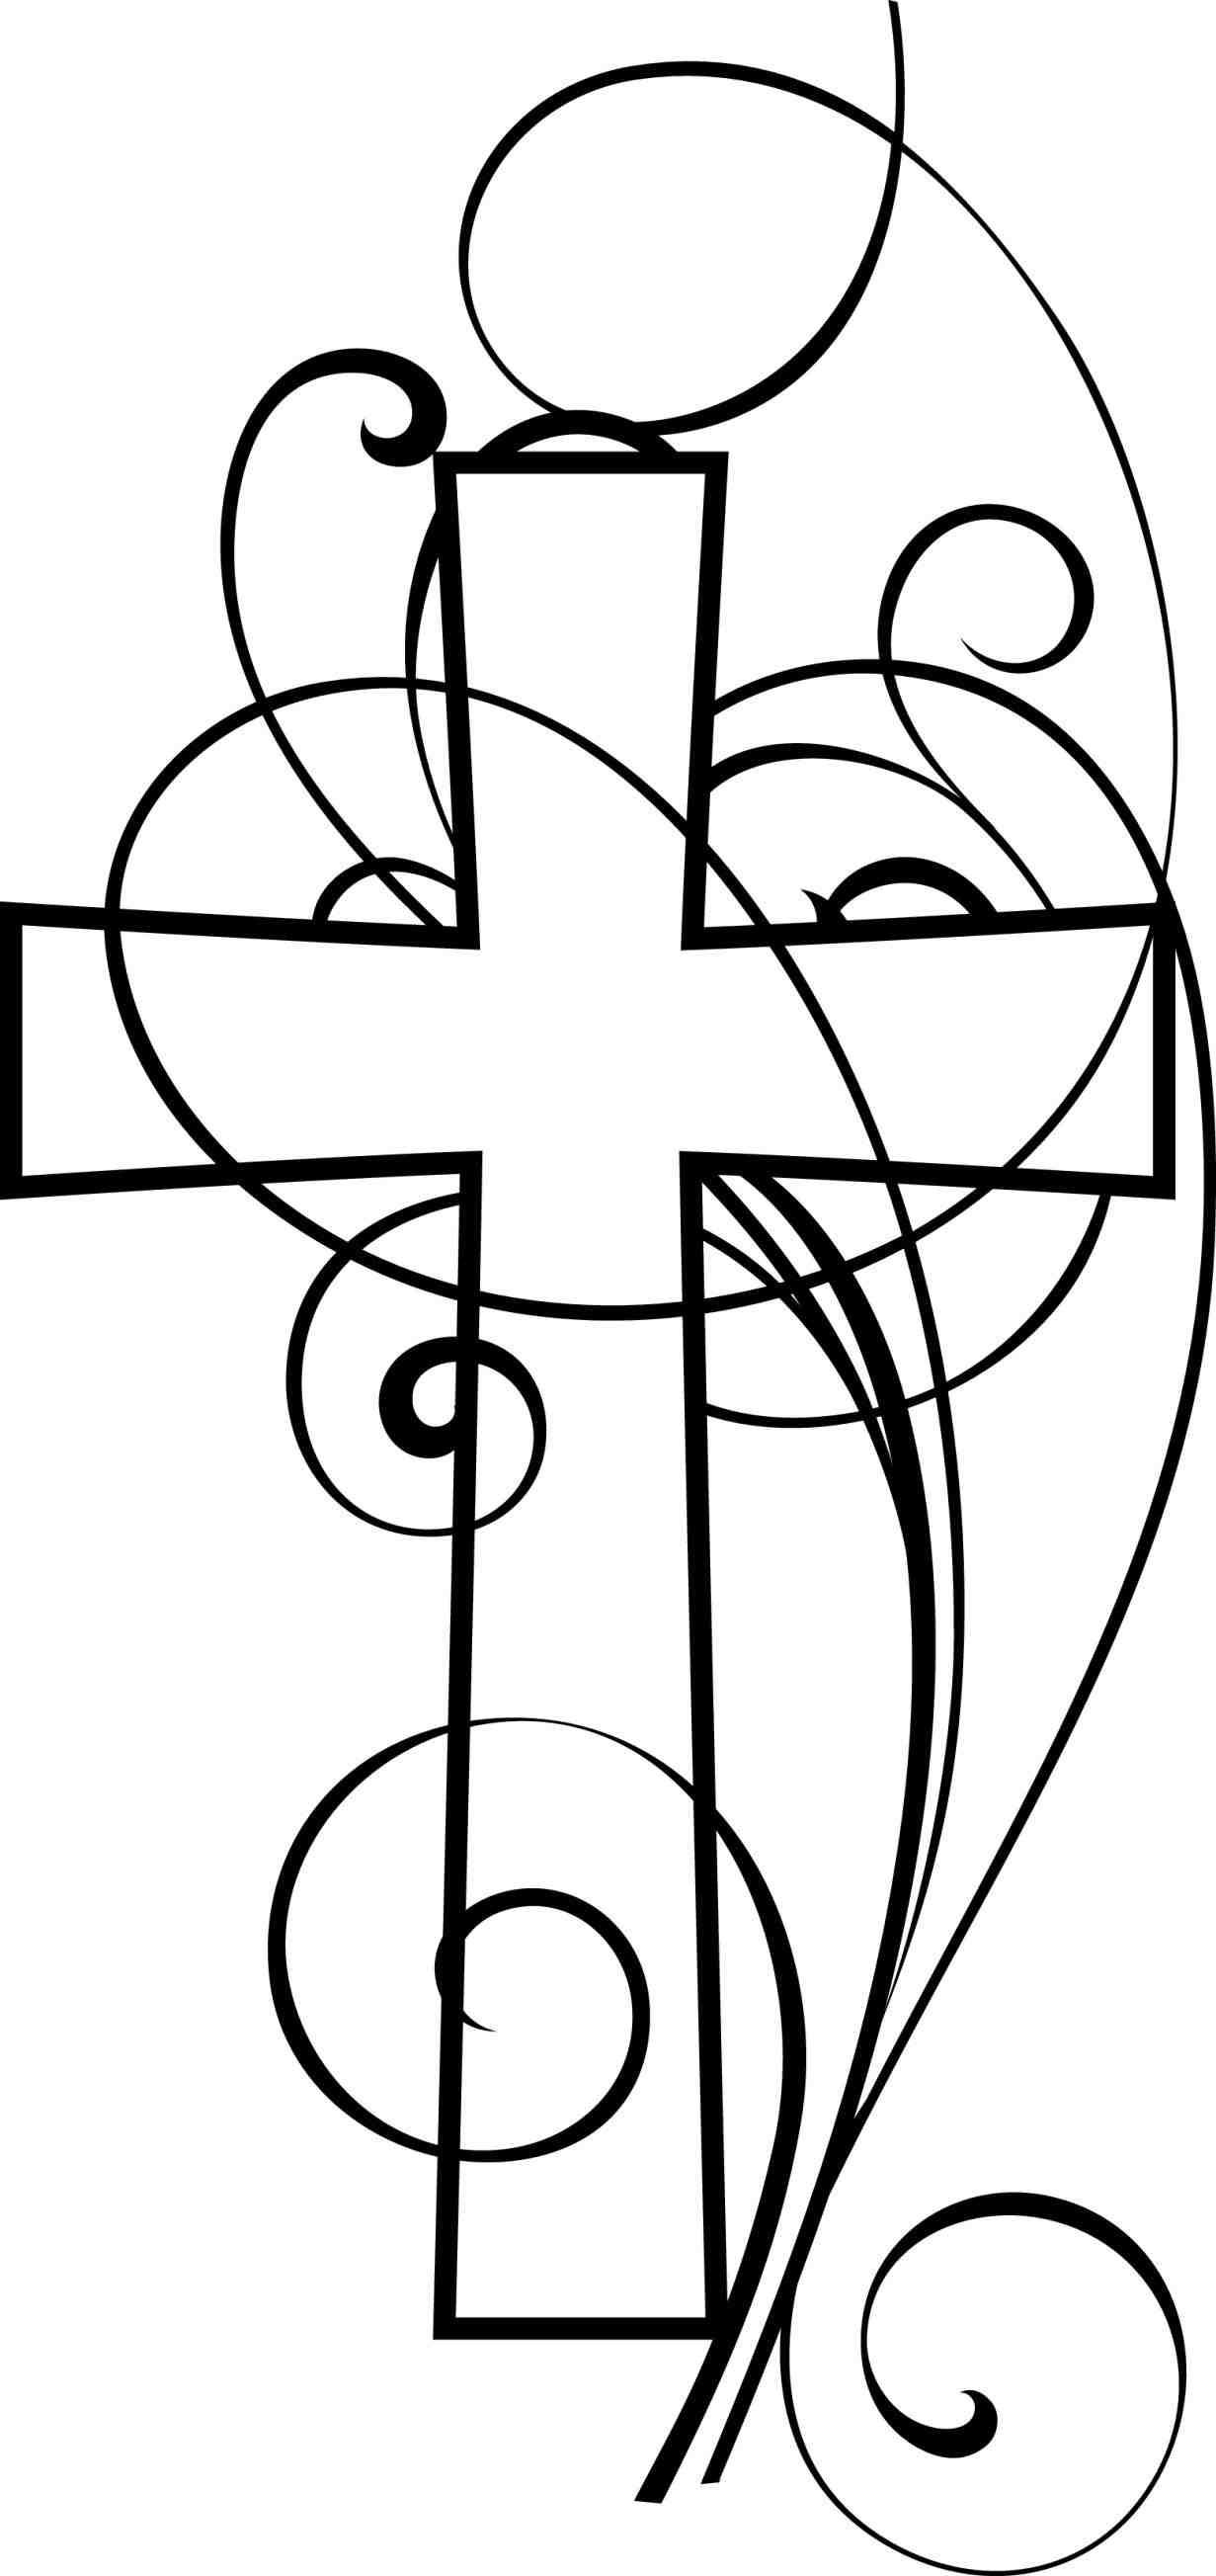 1231x2607 Religious Merry Christmas Clip Art Black White. Nativity Black